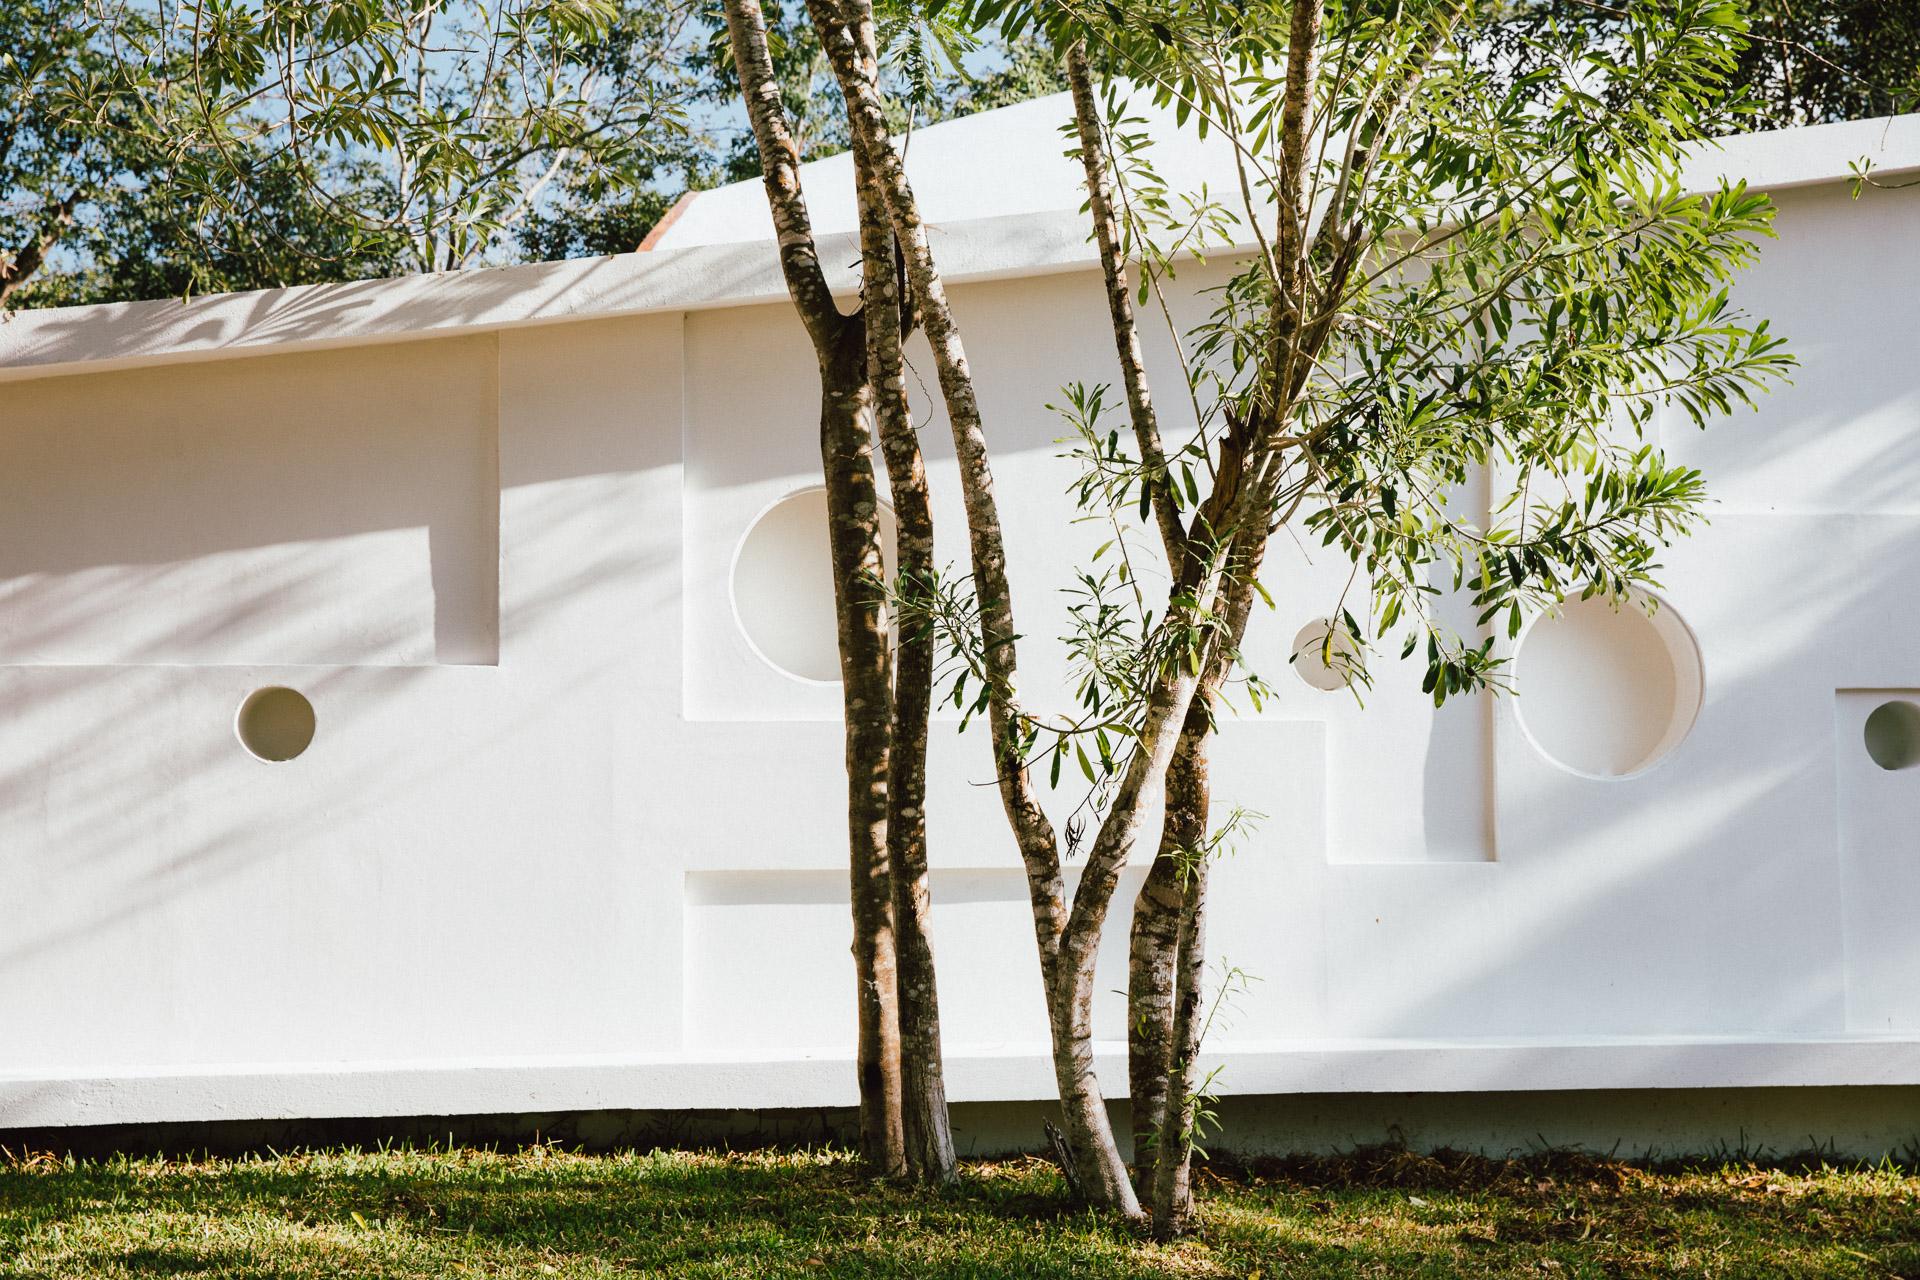 mexico-luxury-hotel-photographer-riviera-maya-mia-bacalar-12.jpg